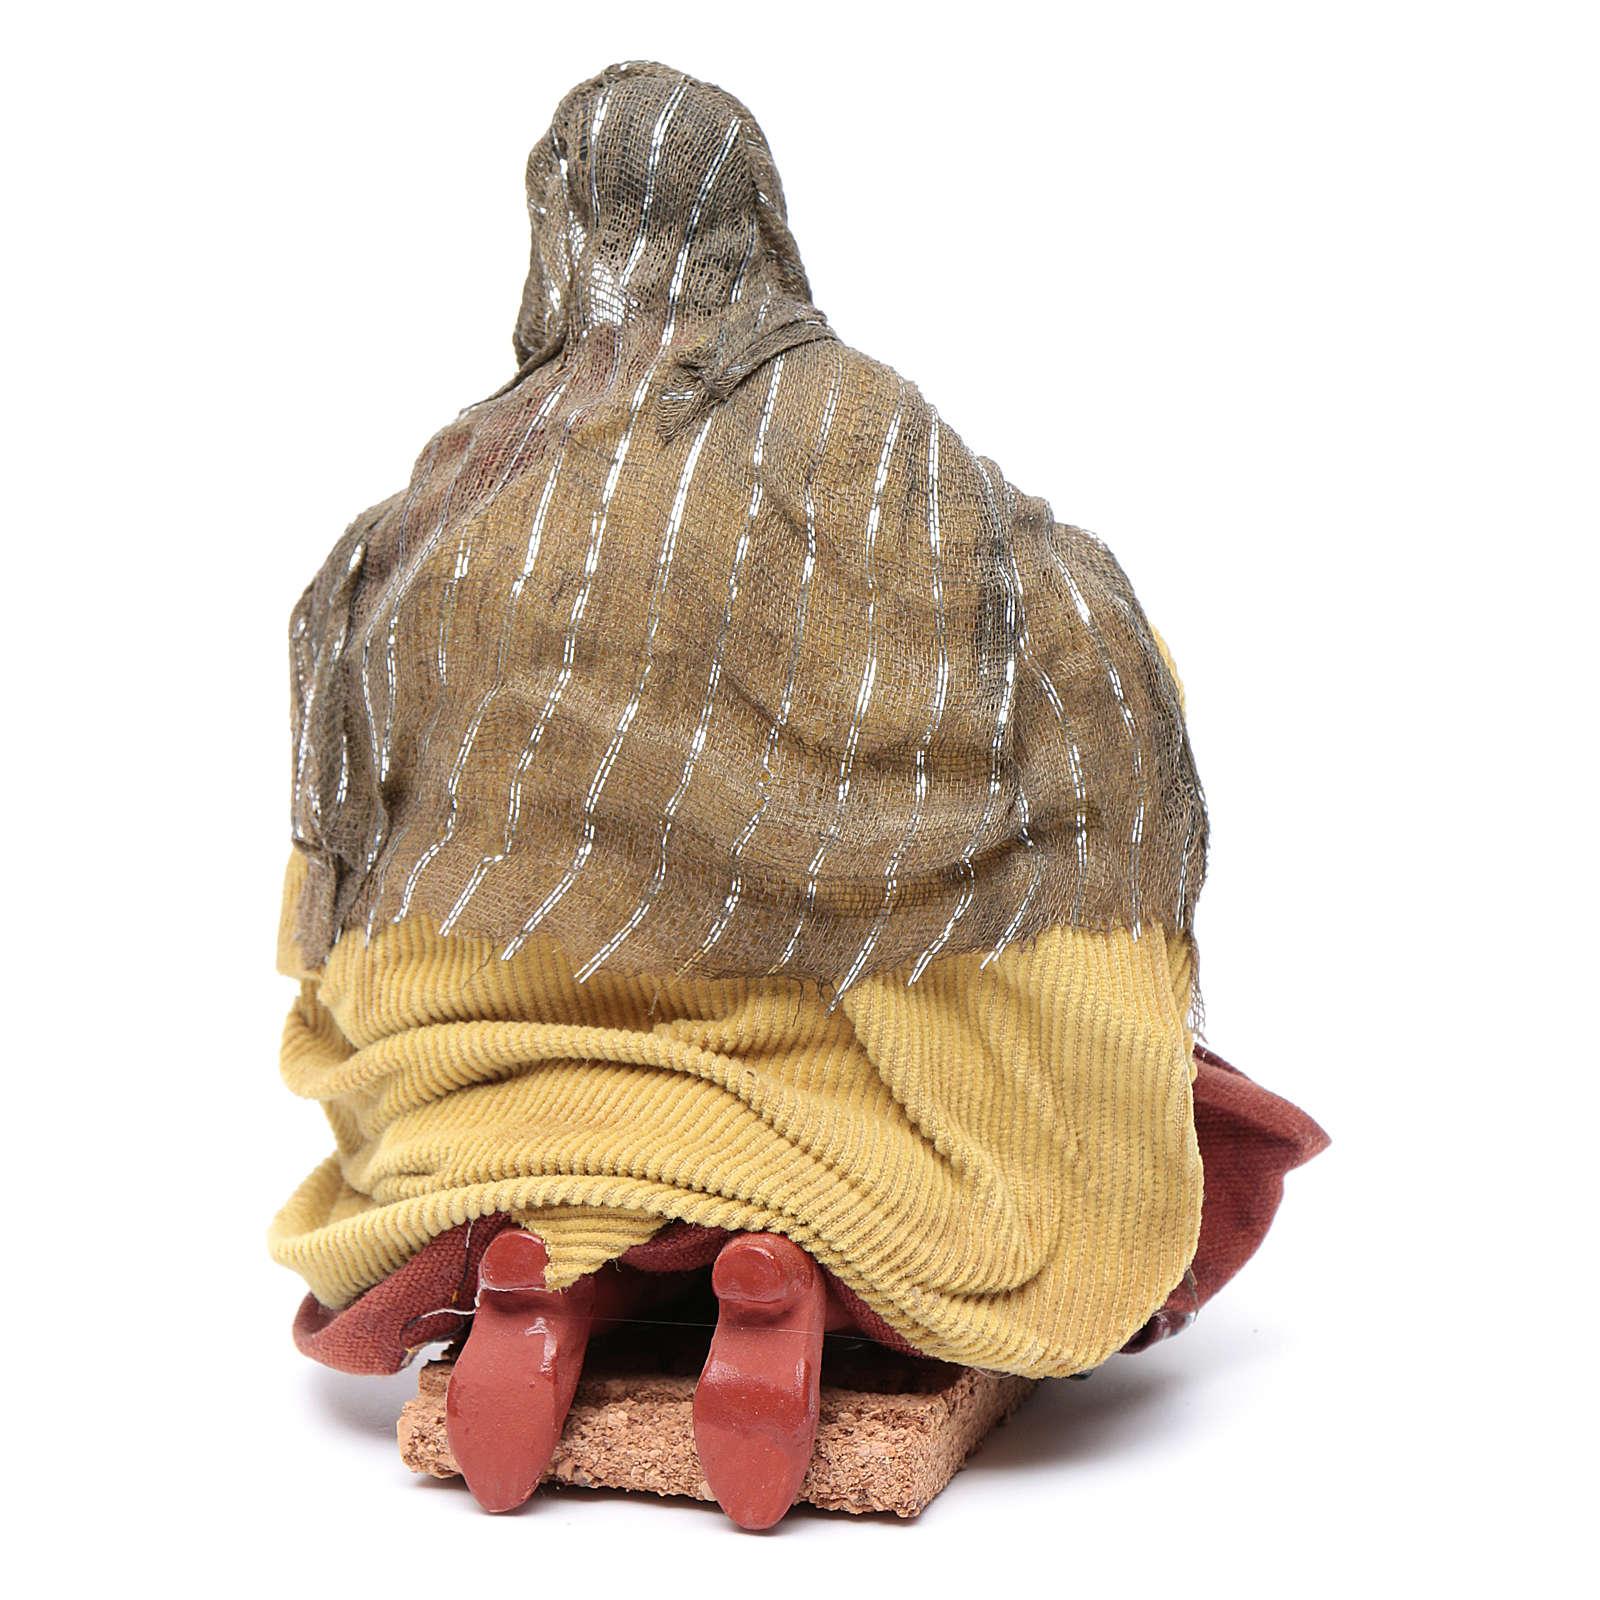 Neapolitan nativity figurine, washerwoman 18cm 4